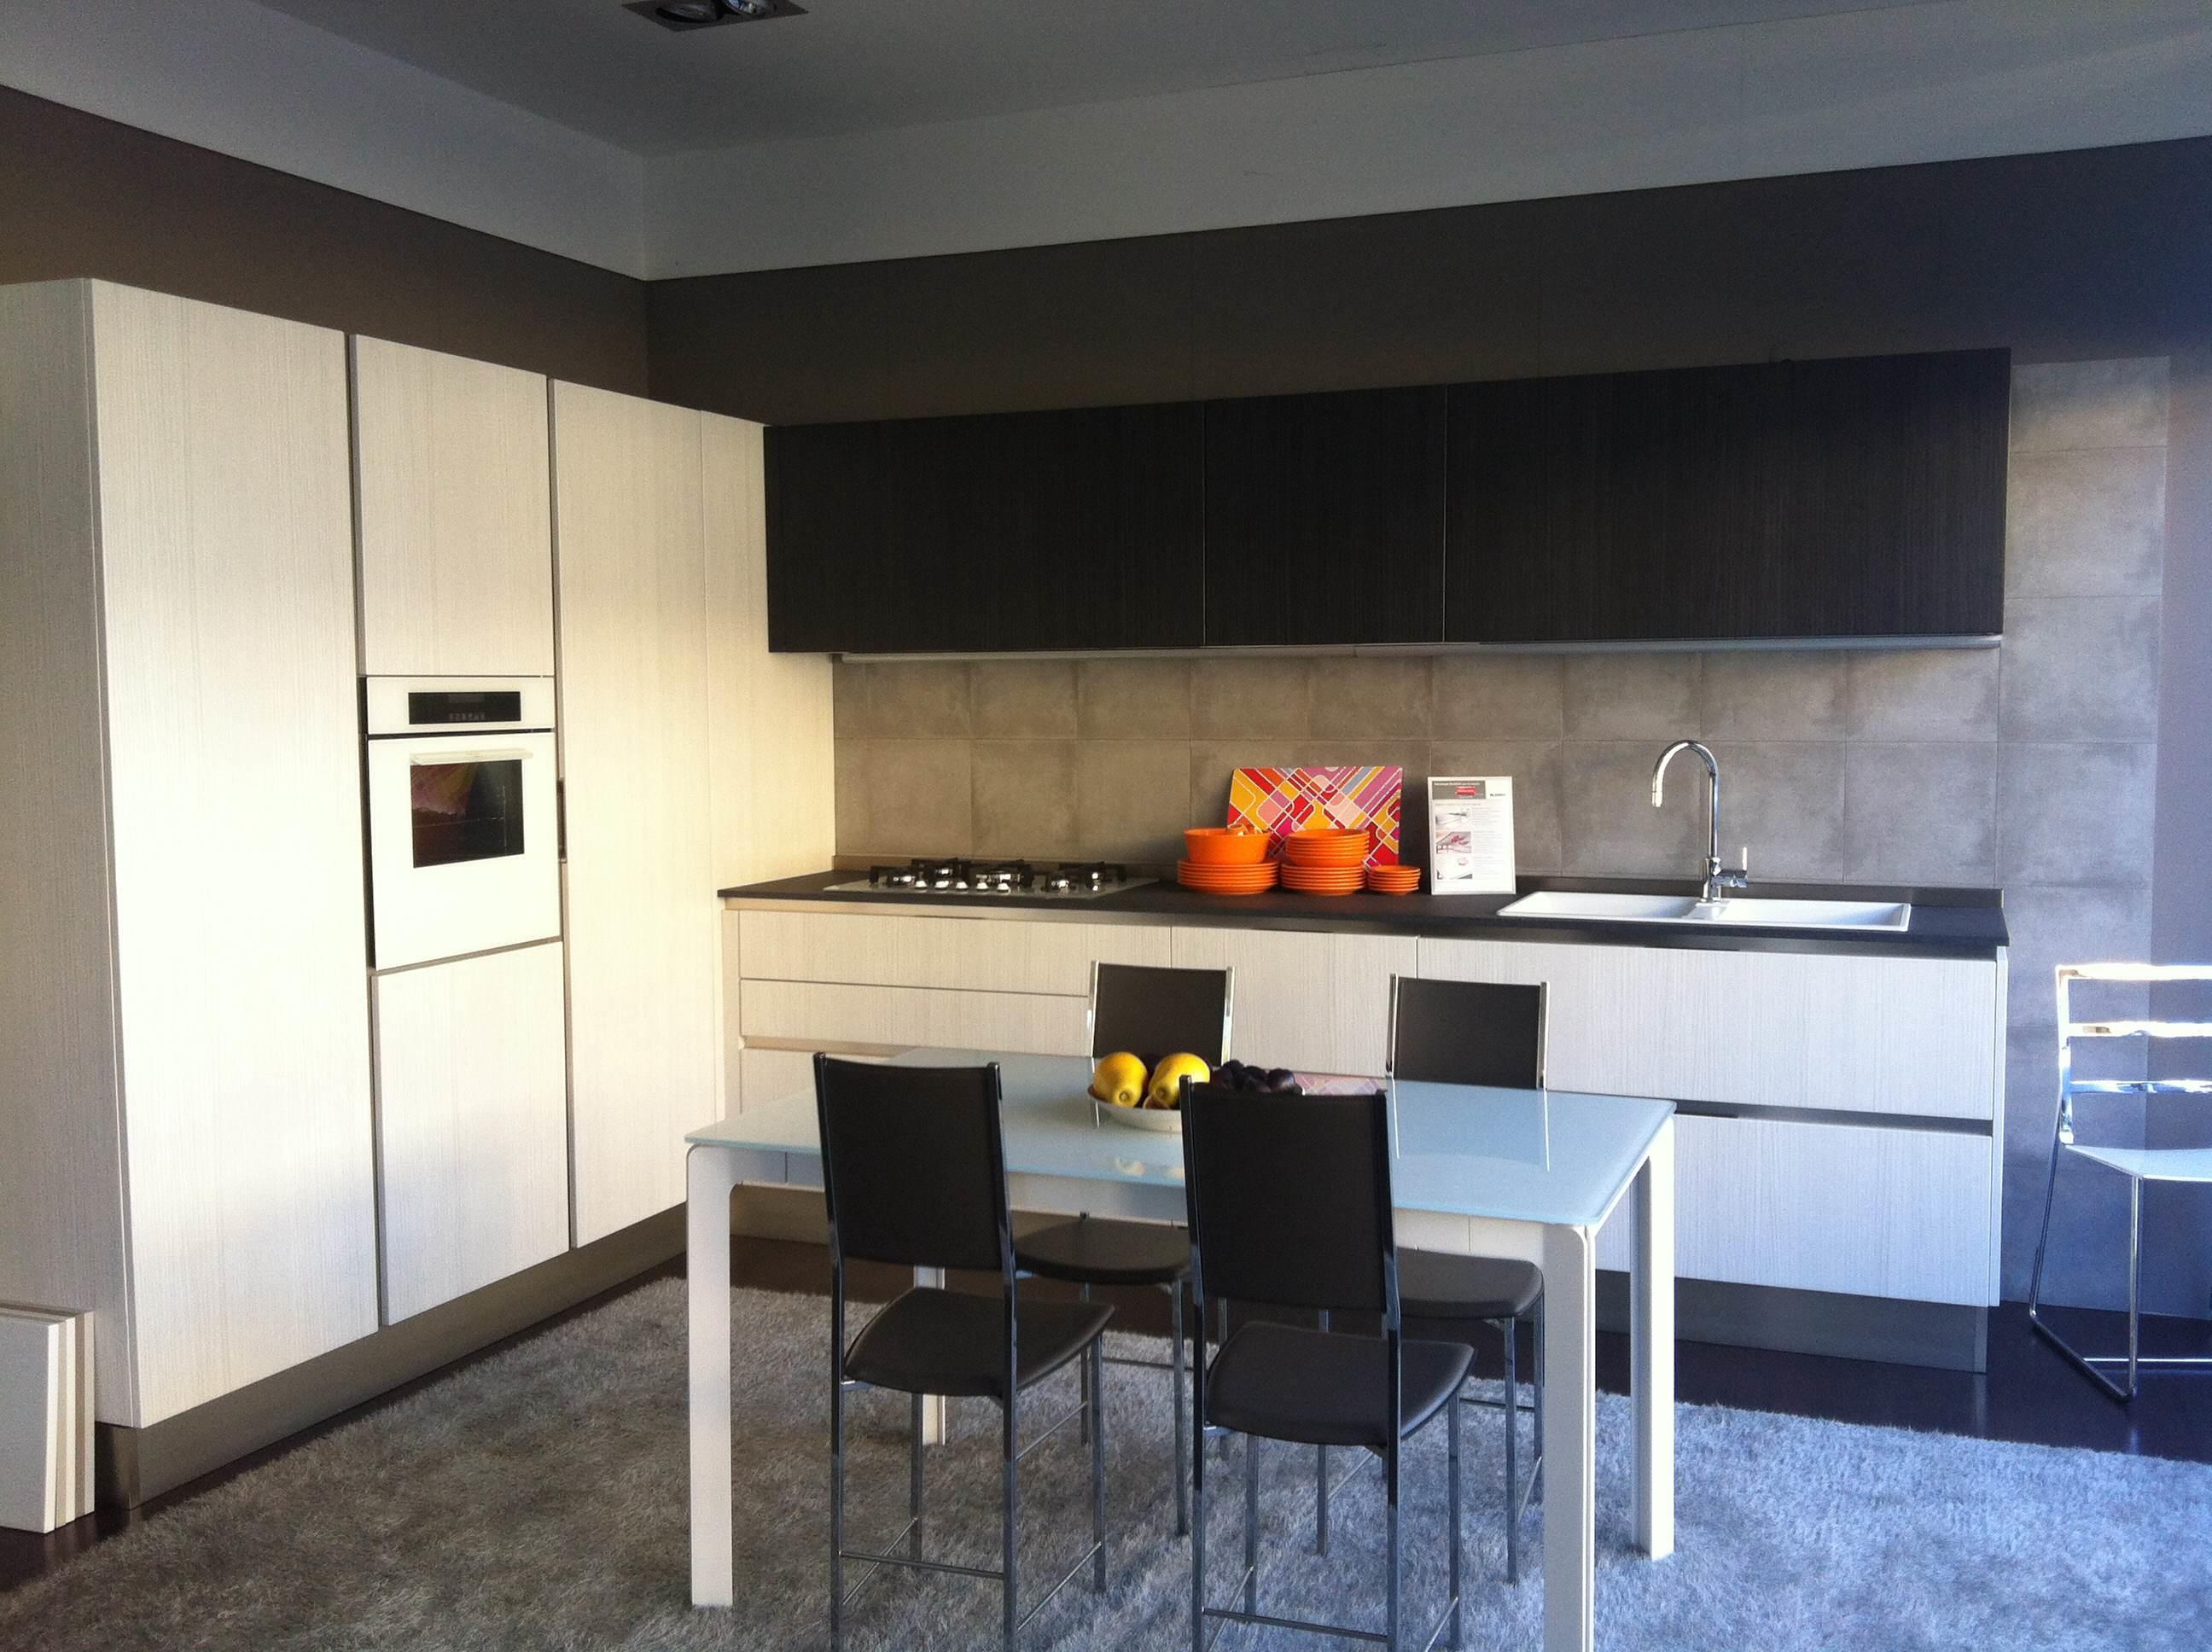 Cucina veneta cucine carrera go moderna laminato materico - Laminato in cucina ...